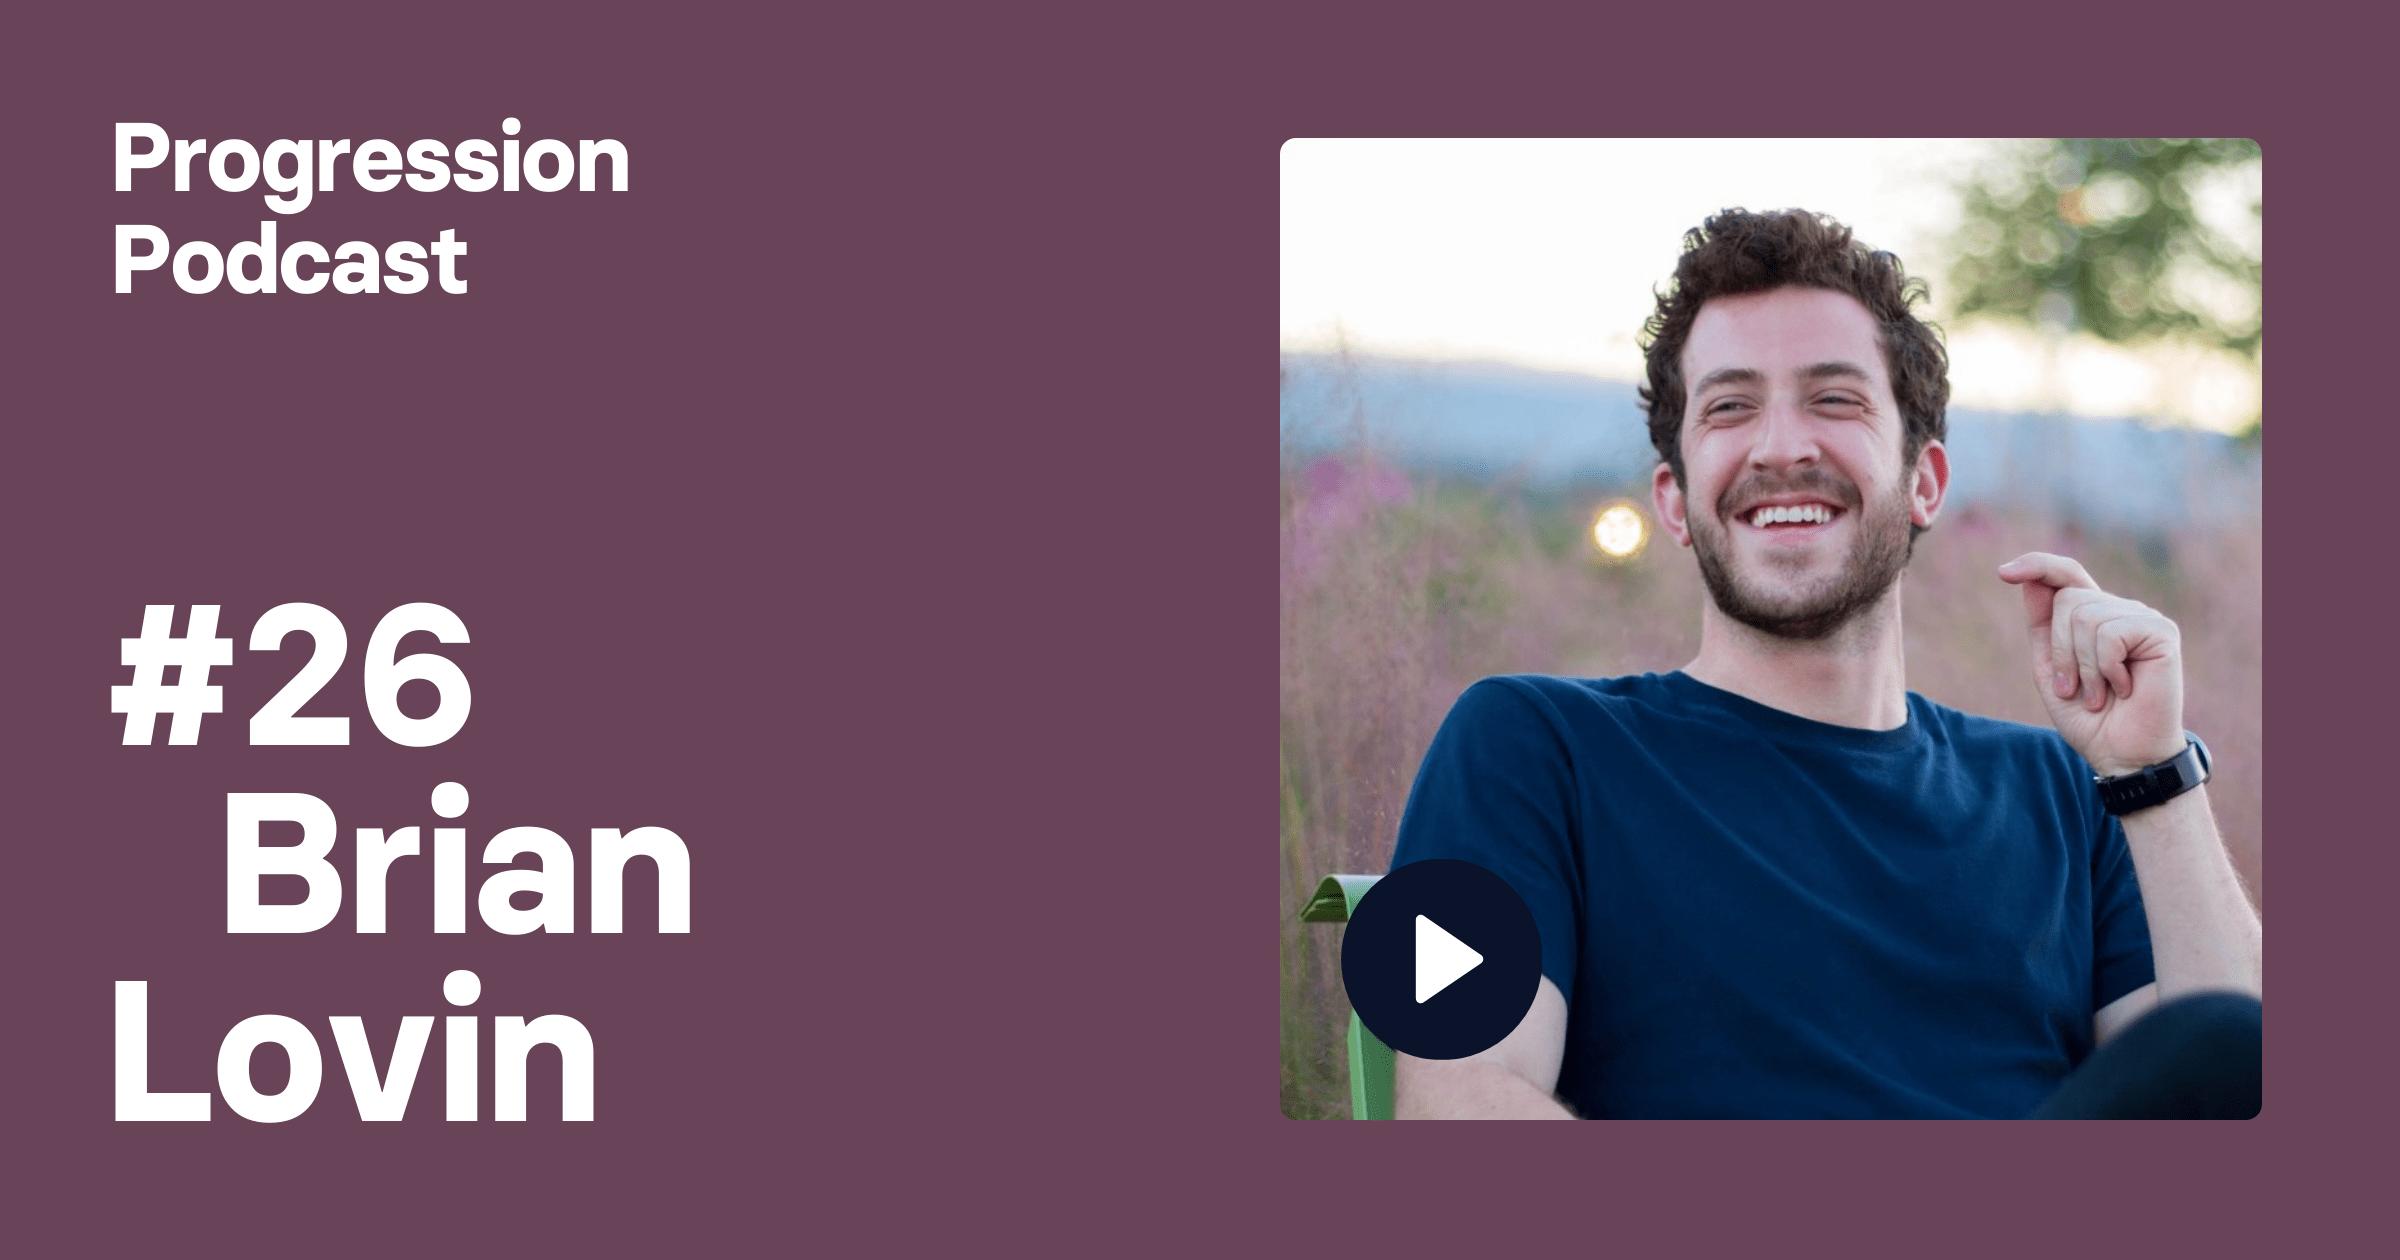 Podcast #26: Brian Lovin (Github, Spectrum, Design Details) on the rise of the senior IC